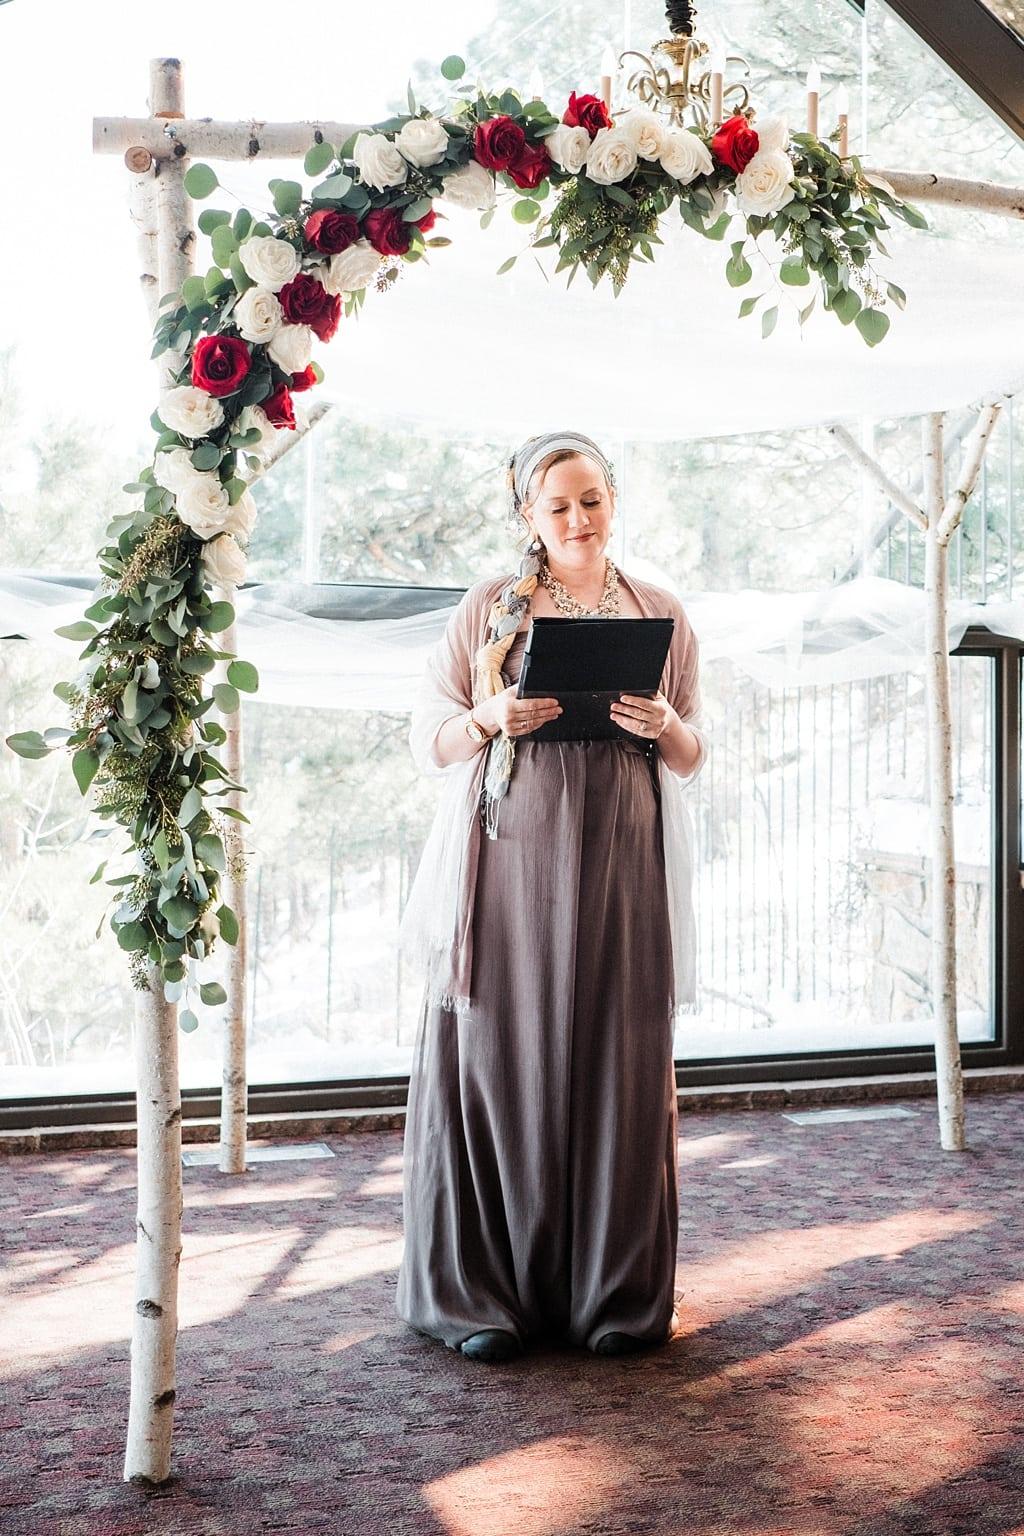 Officiant under chuppah at Flagstaff House wedding venue Boulder Colorado